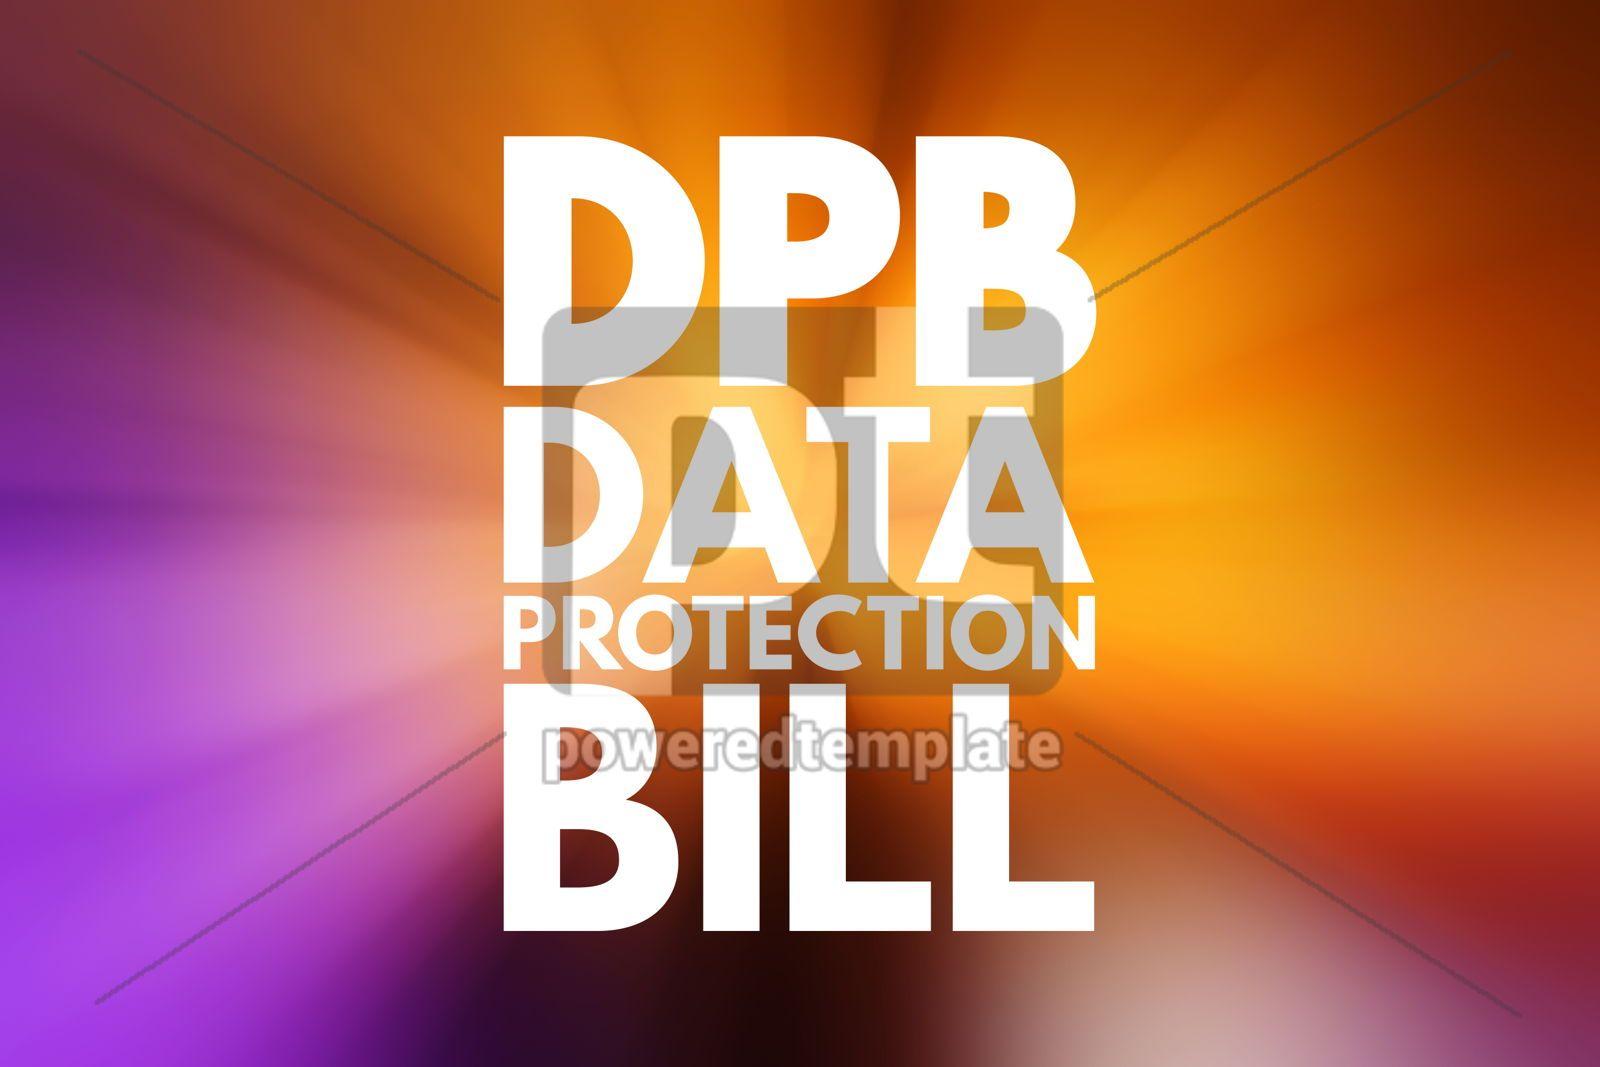 DPB - Data Protection Bill acronym technology concept backgroun, 16158, Business — PoweredTemplate.com